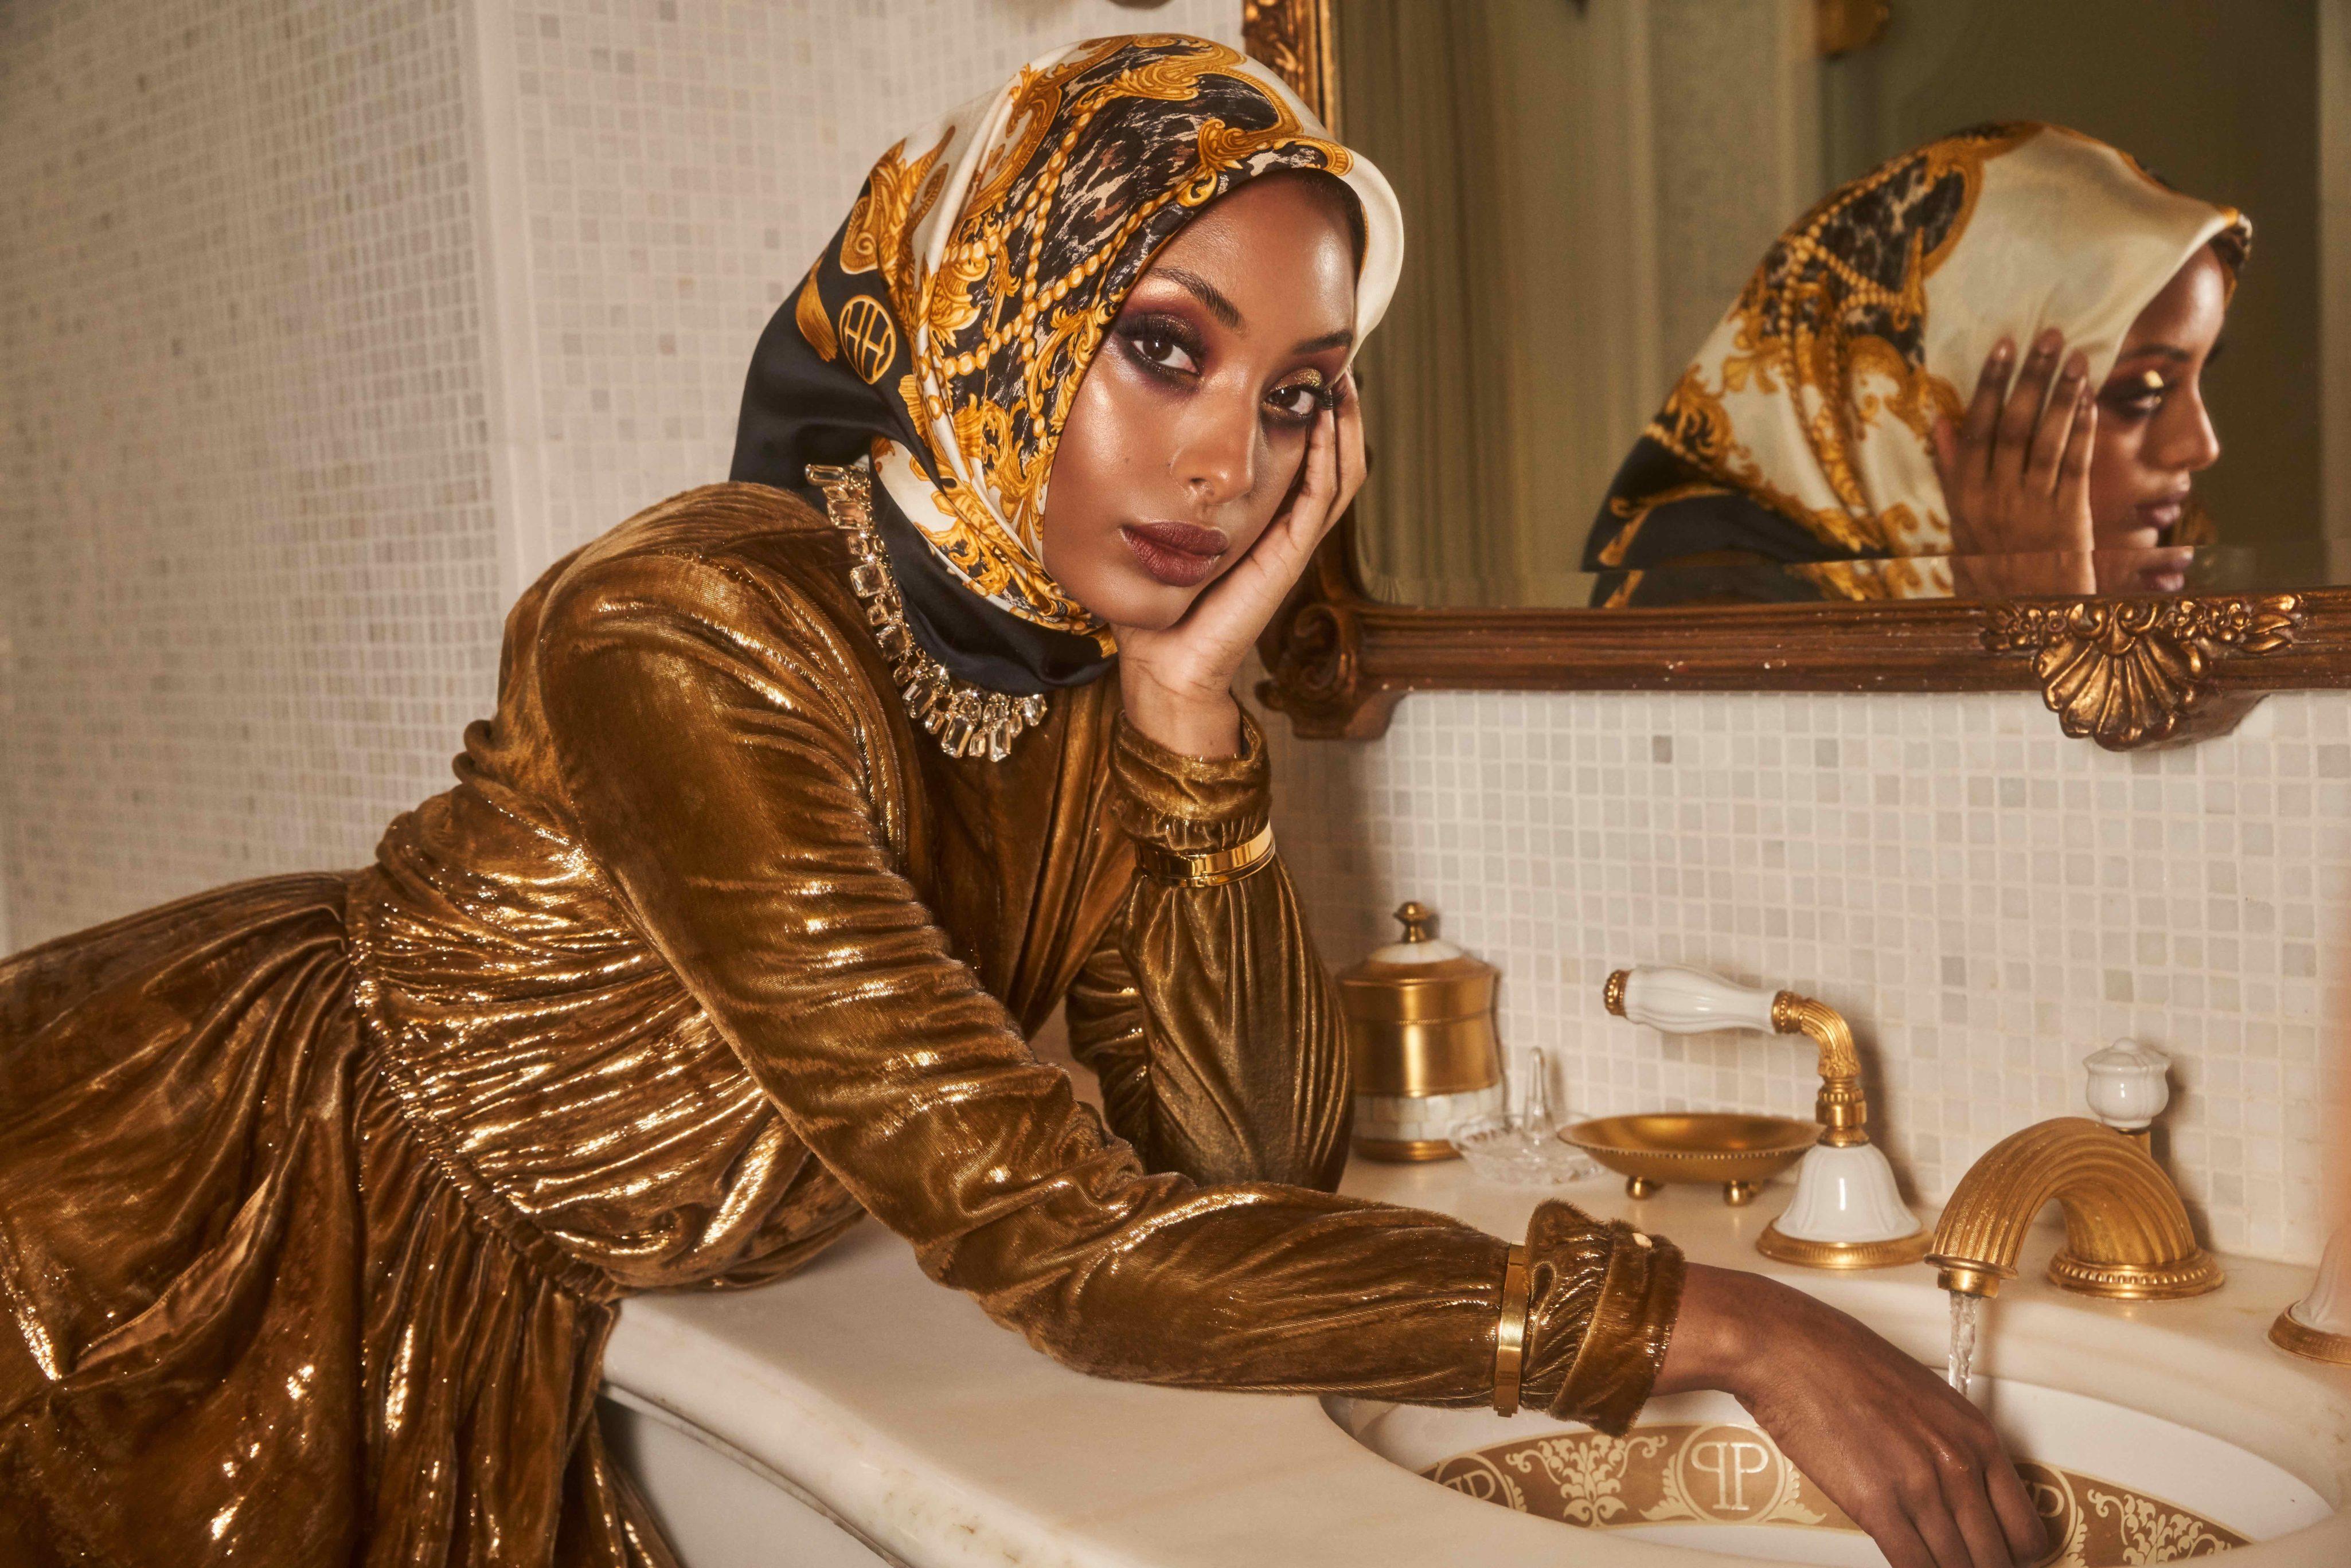 A woman models a hijab